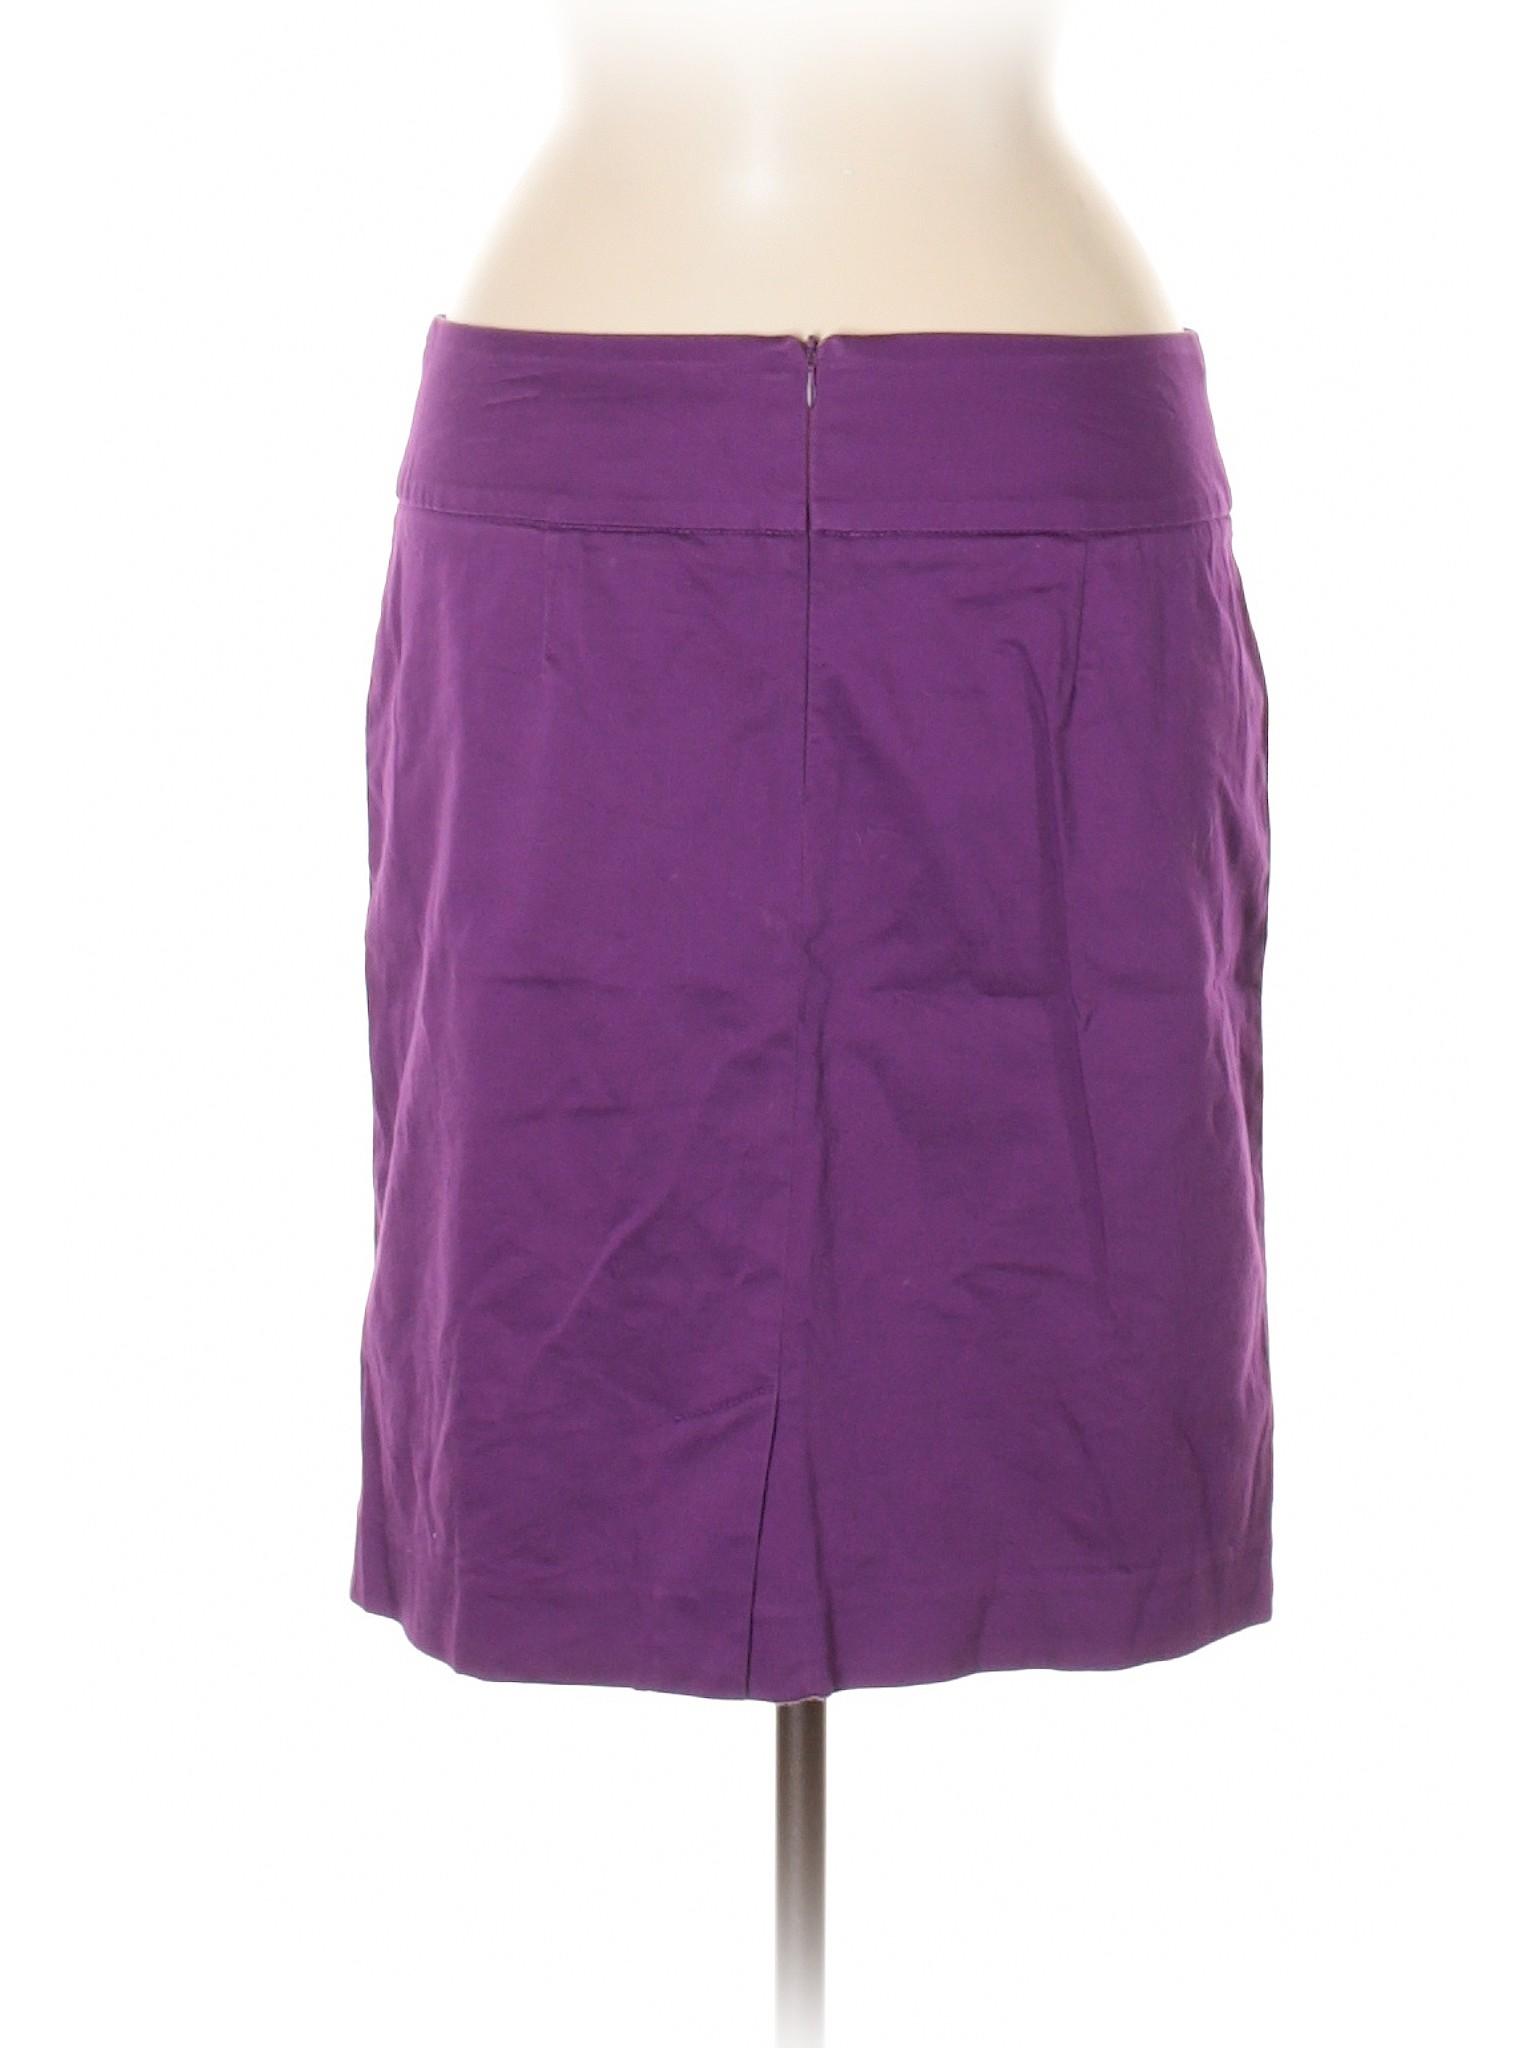 Sandro Sandro Sandro Skirt Boutique Casual Boutique Skirt Studio Boutique Casual Skirt Casual Studio Studio qvHwfdFd5x